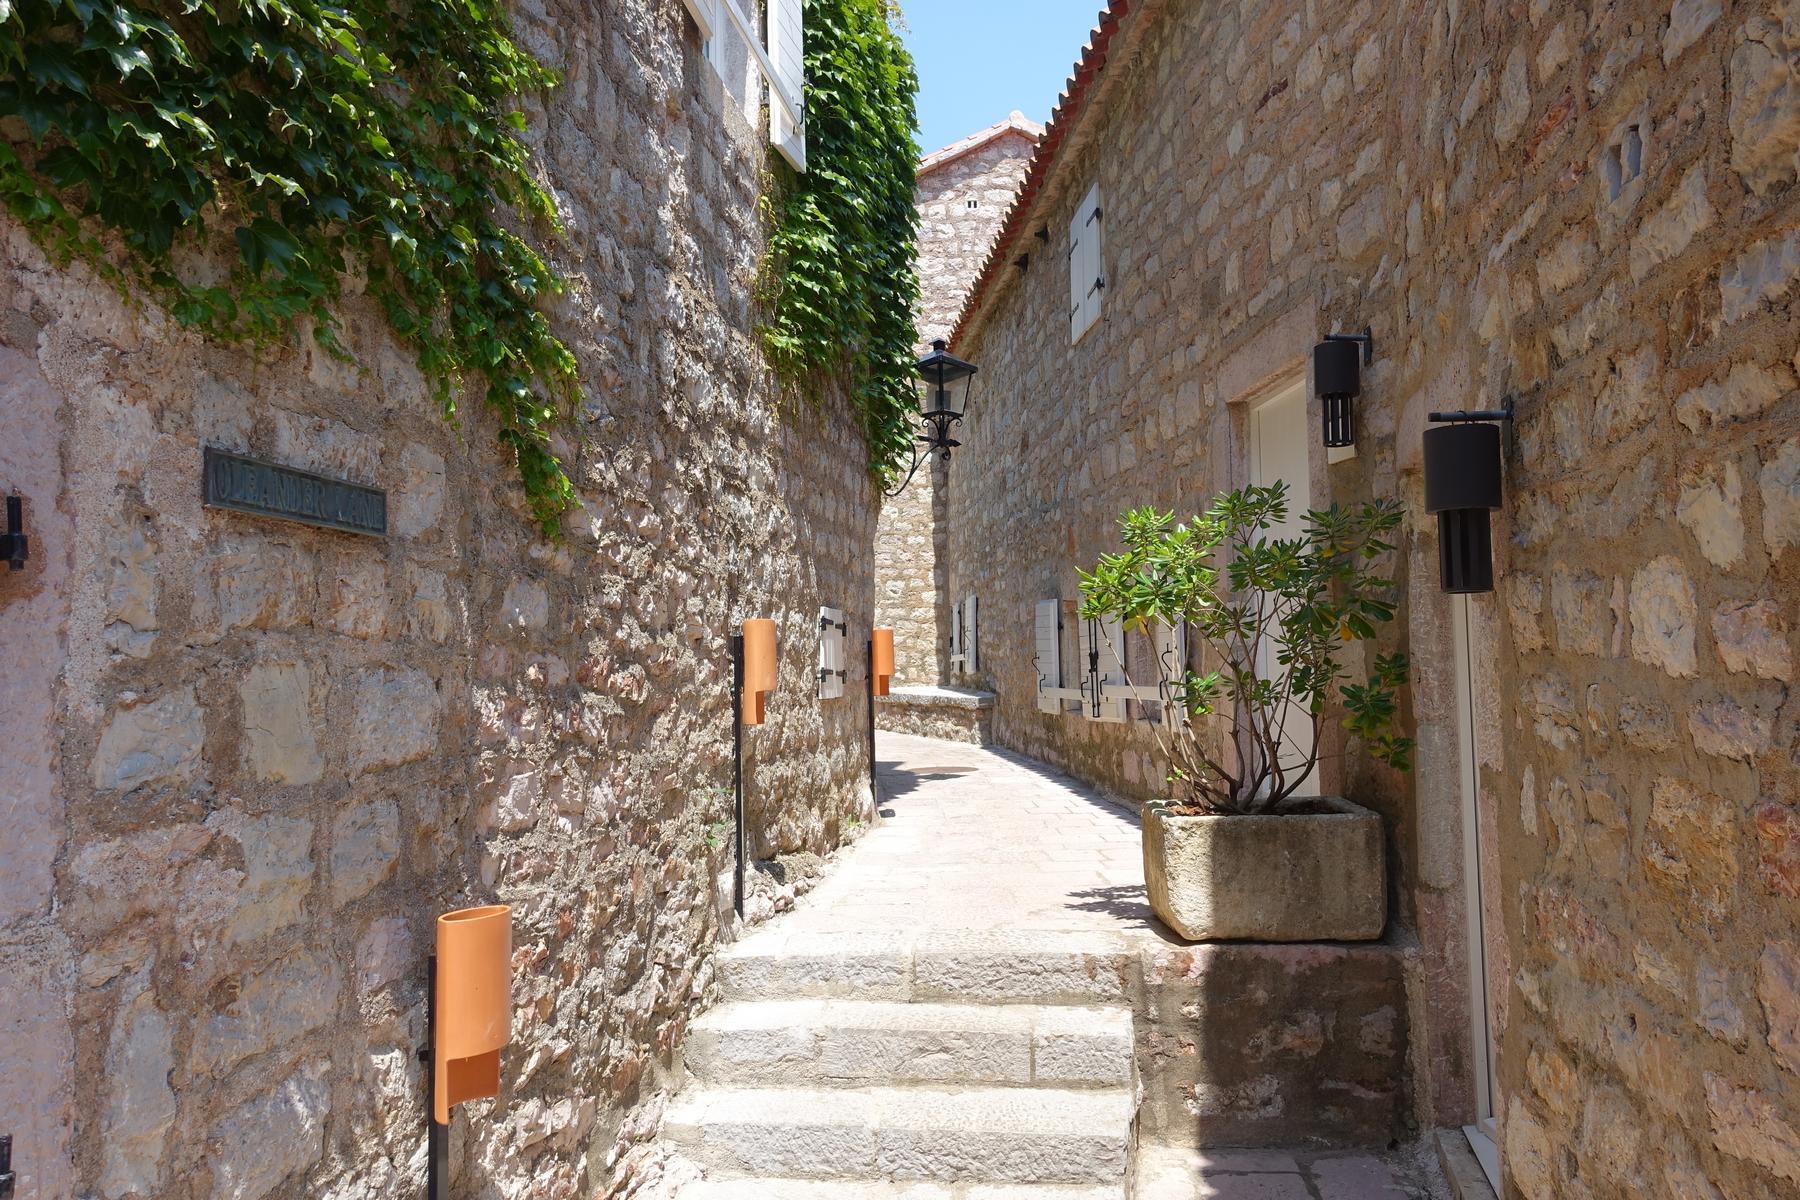 One of narrow streets - Sveti Stefan